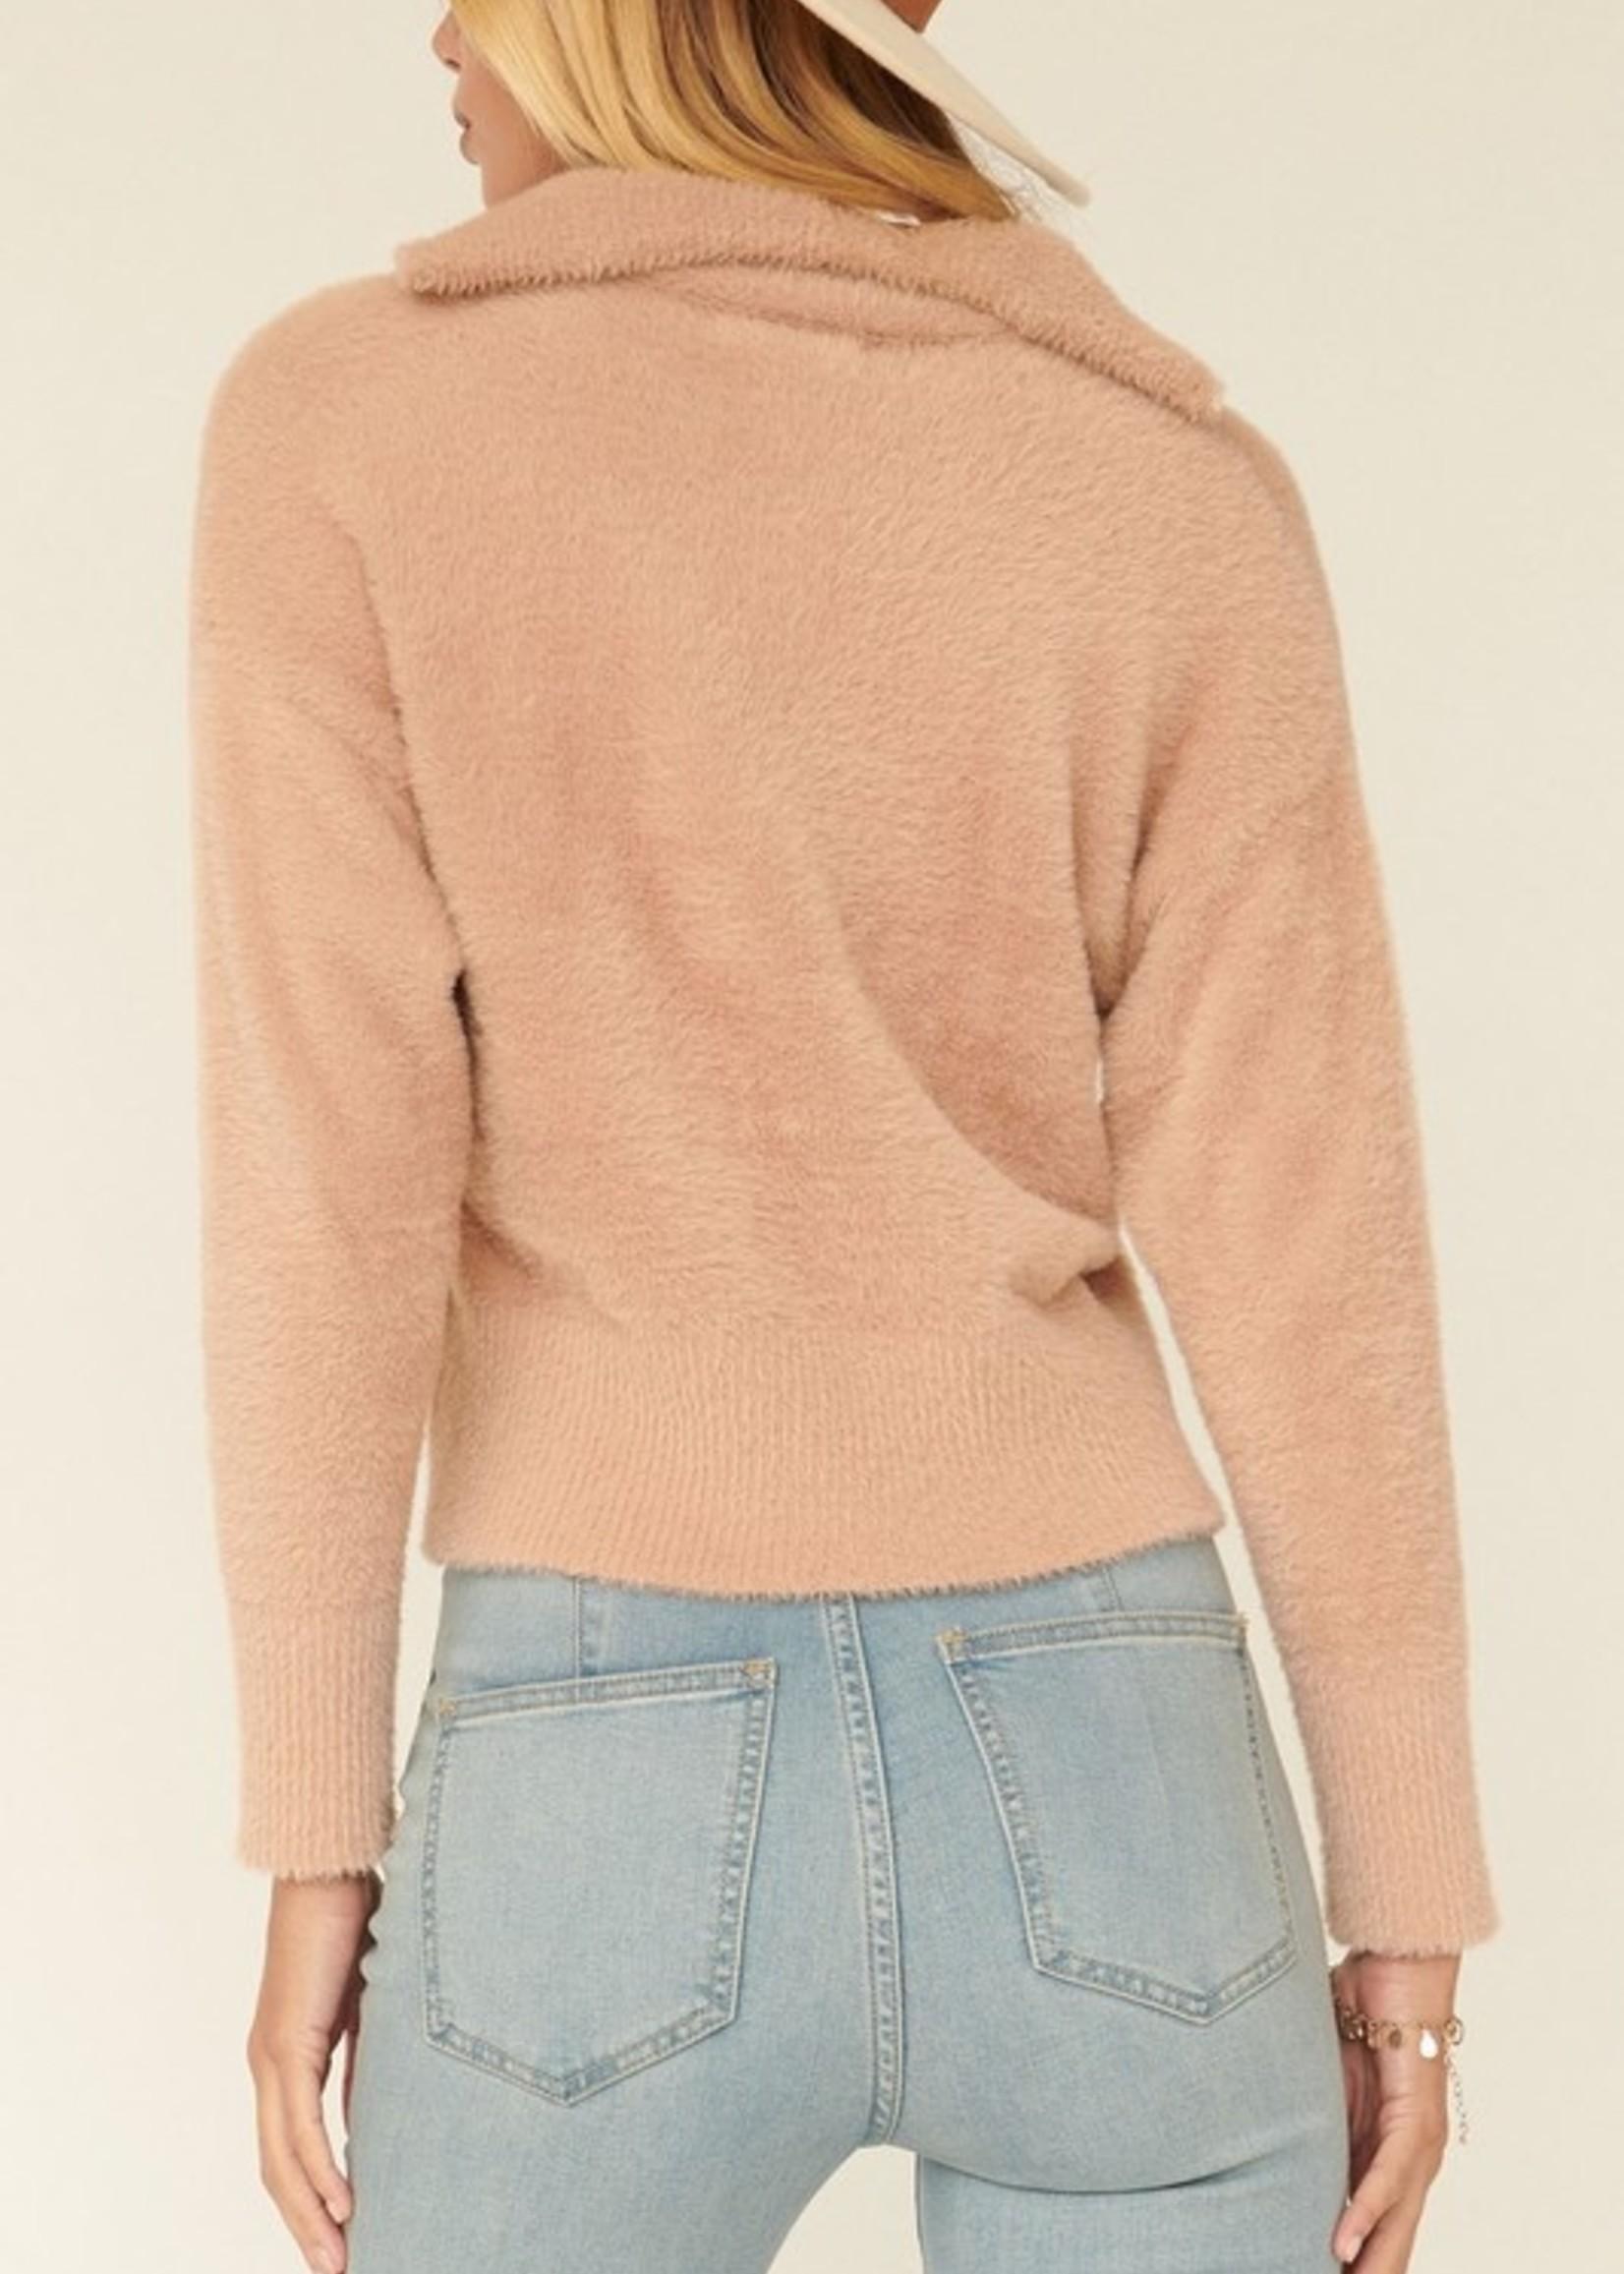 Fuzzy Quarter Zip Sweater - Blush